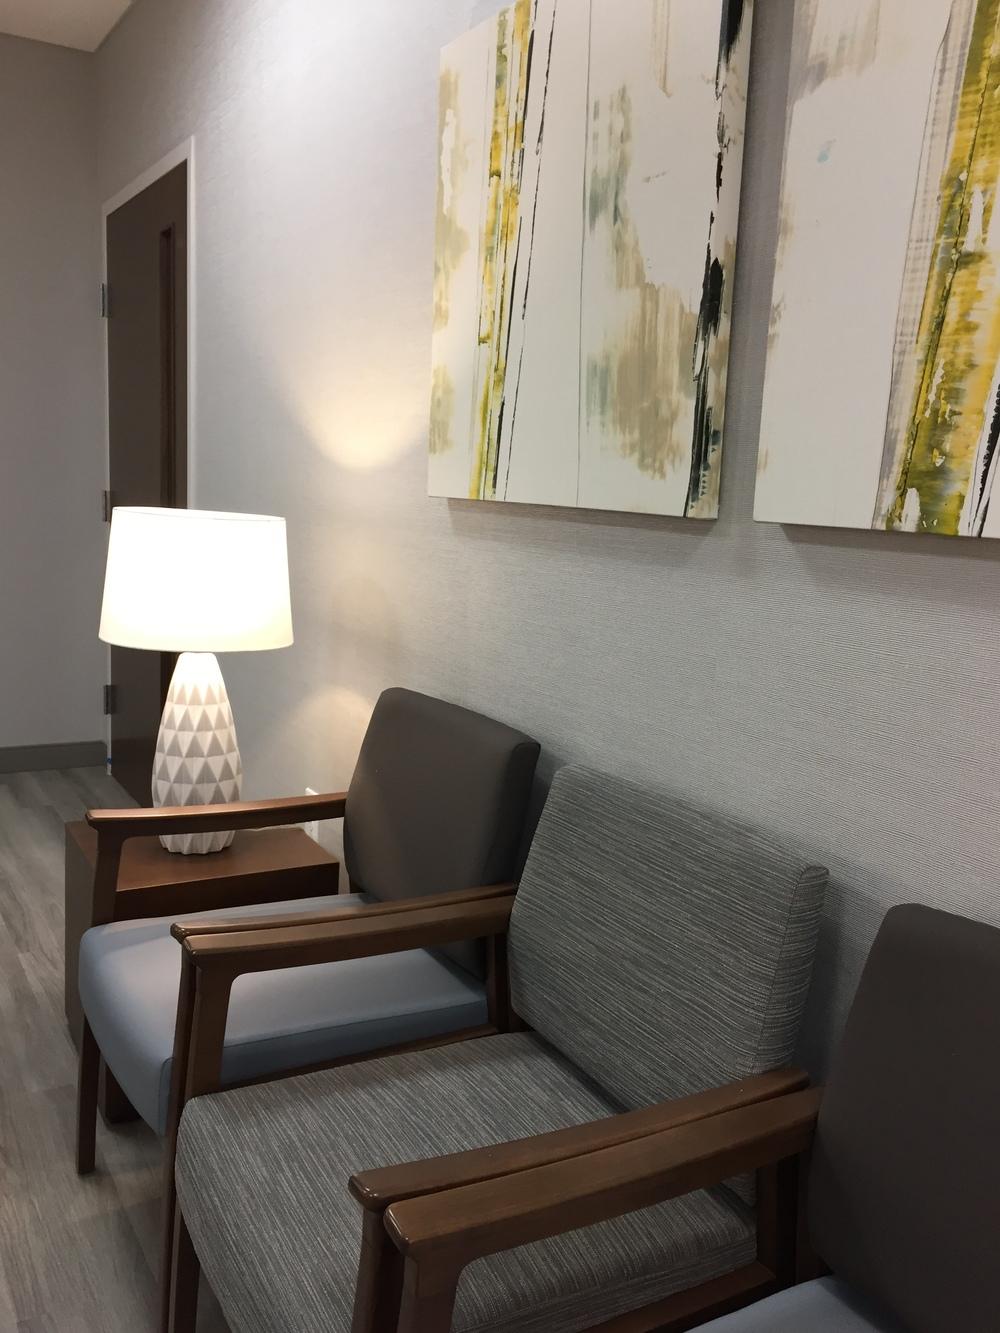 Alexis Pearl Design | Texas Vascular Associates, modern doctors office, grey, Arden Art, Geiger, Crate & Barrel Patina Cube table